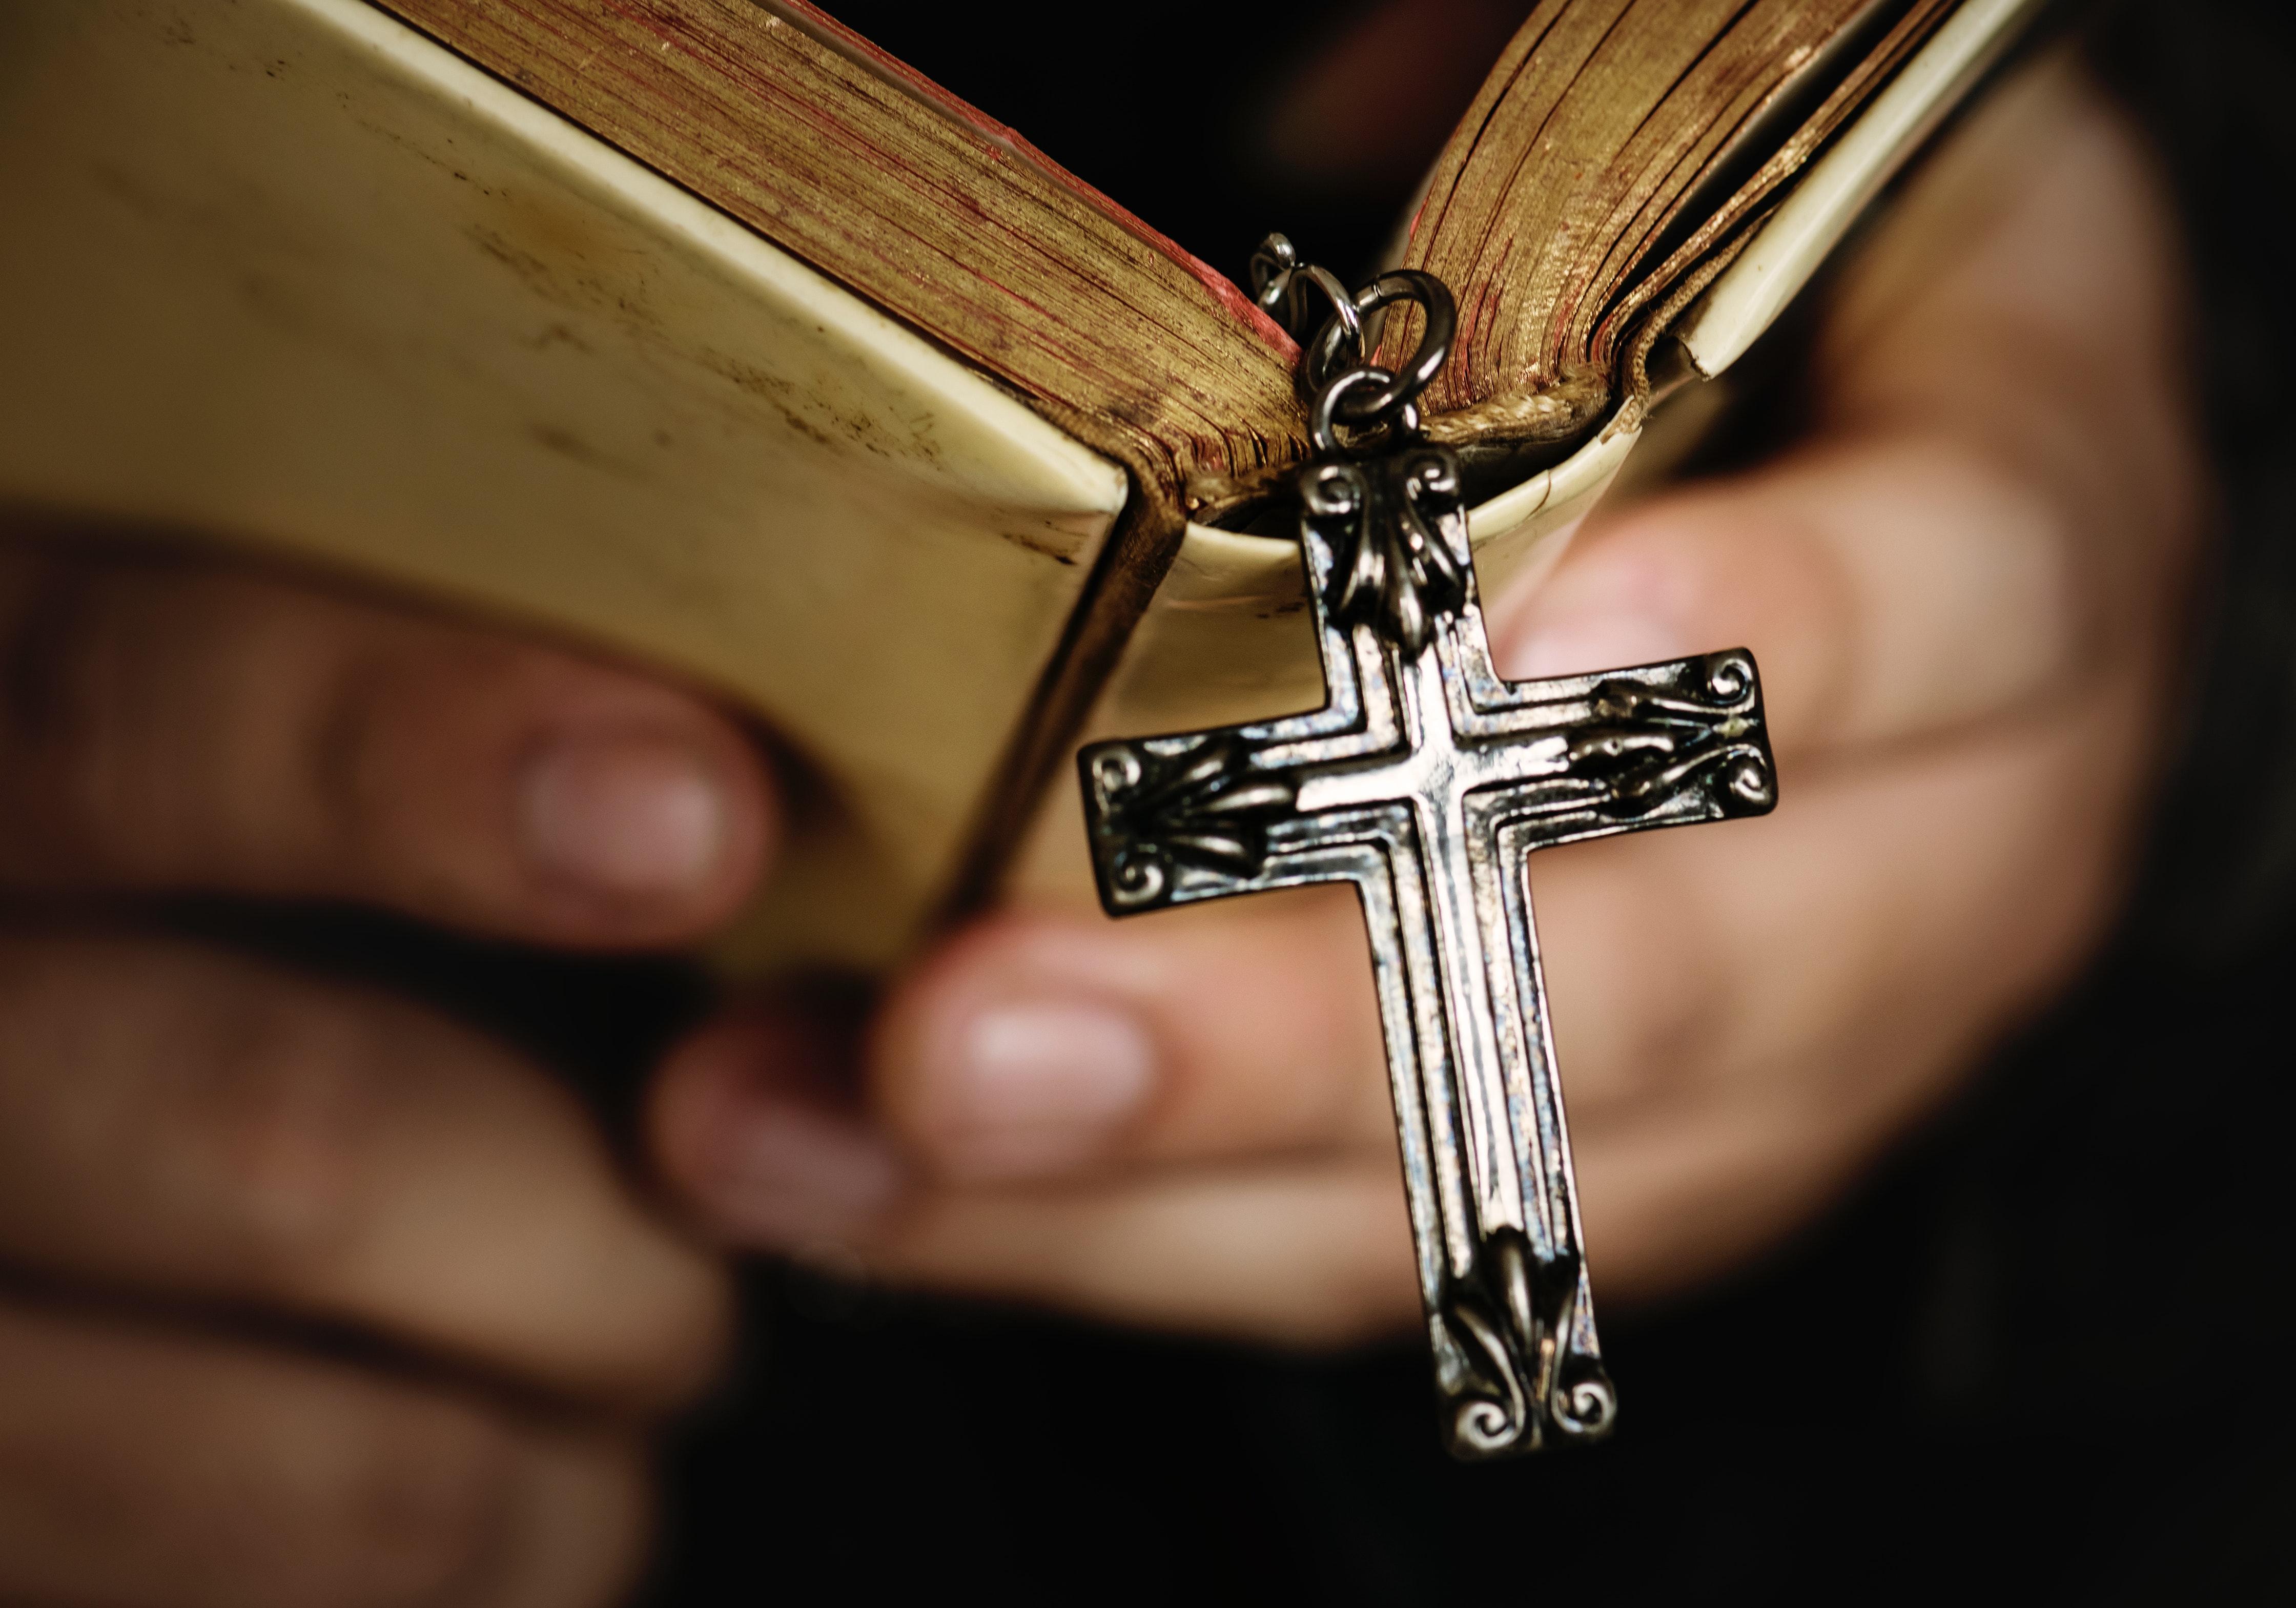 Litigation Update: Roman Catholic Archdiocese of San Juan, Puerto Rico v. Feliciano